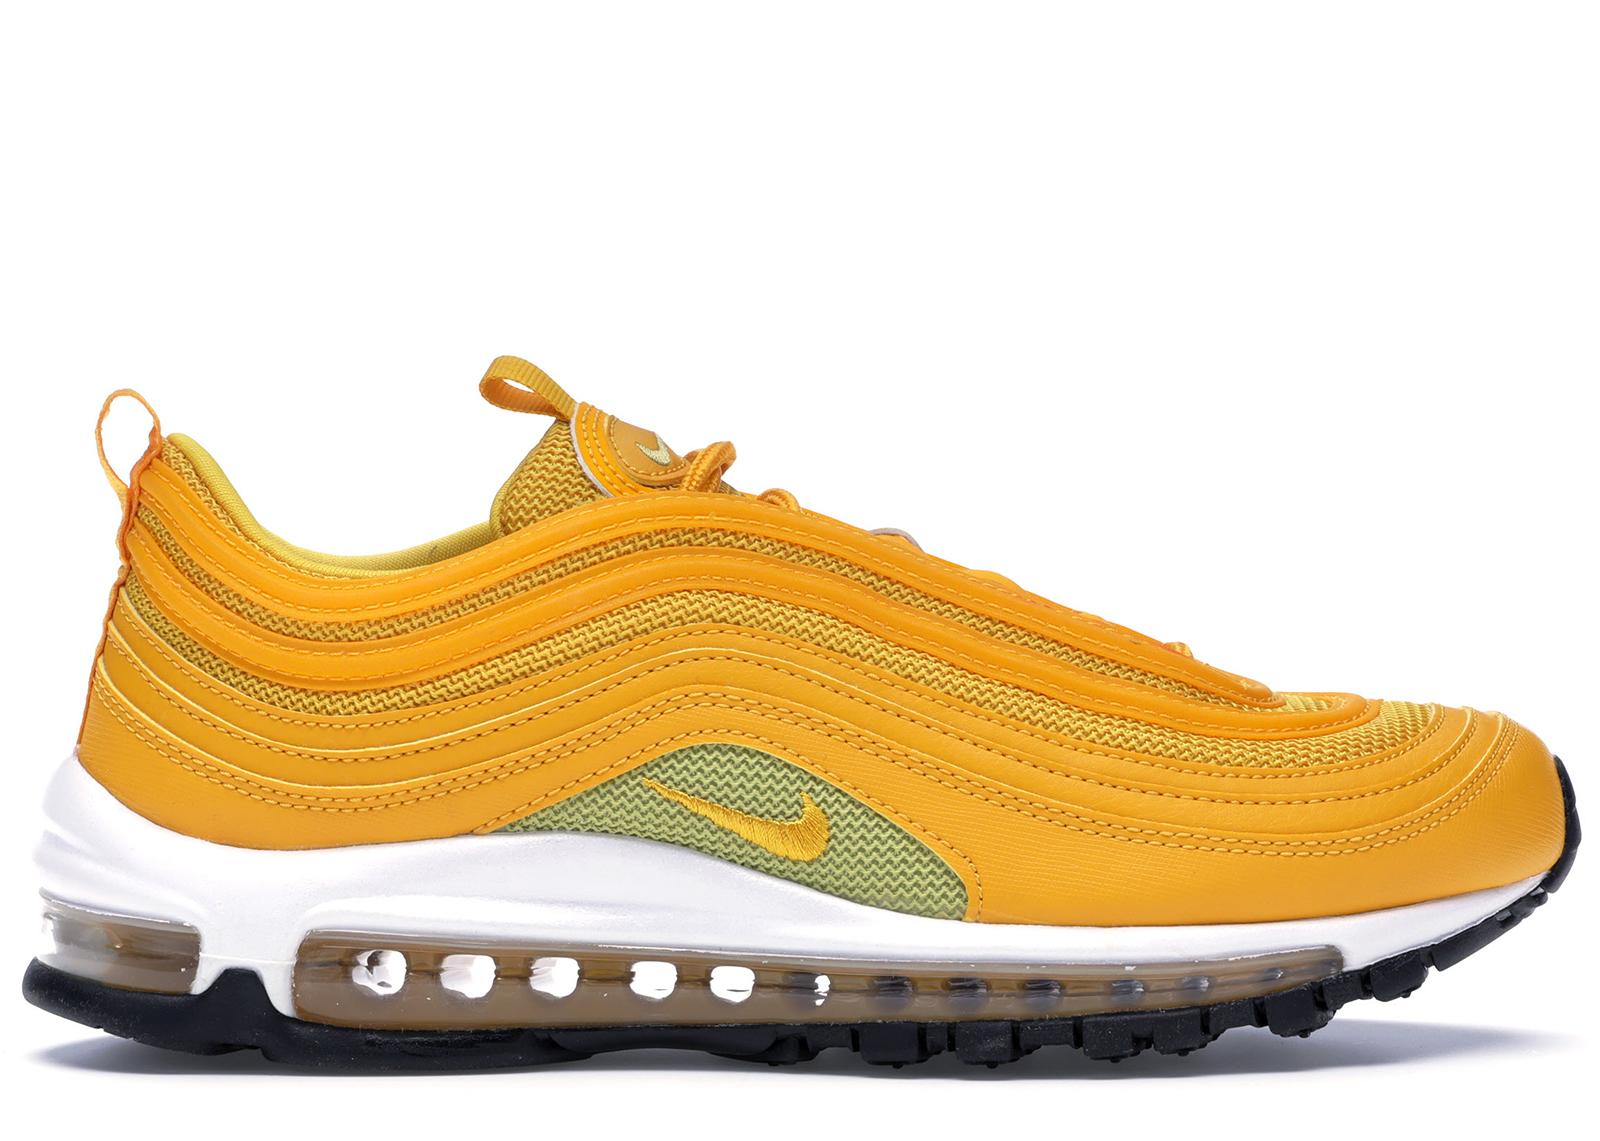 Nike Air Max 97 Mustard (W) - 921733-701